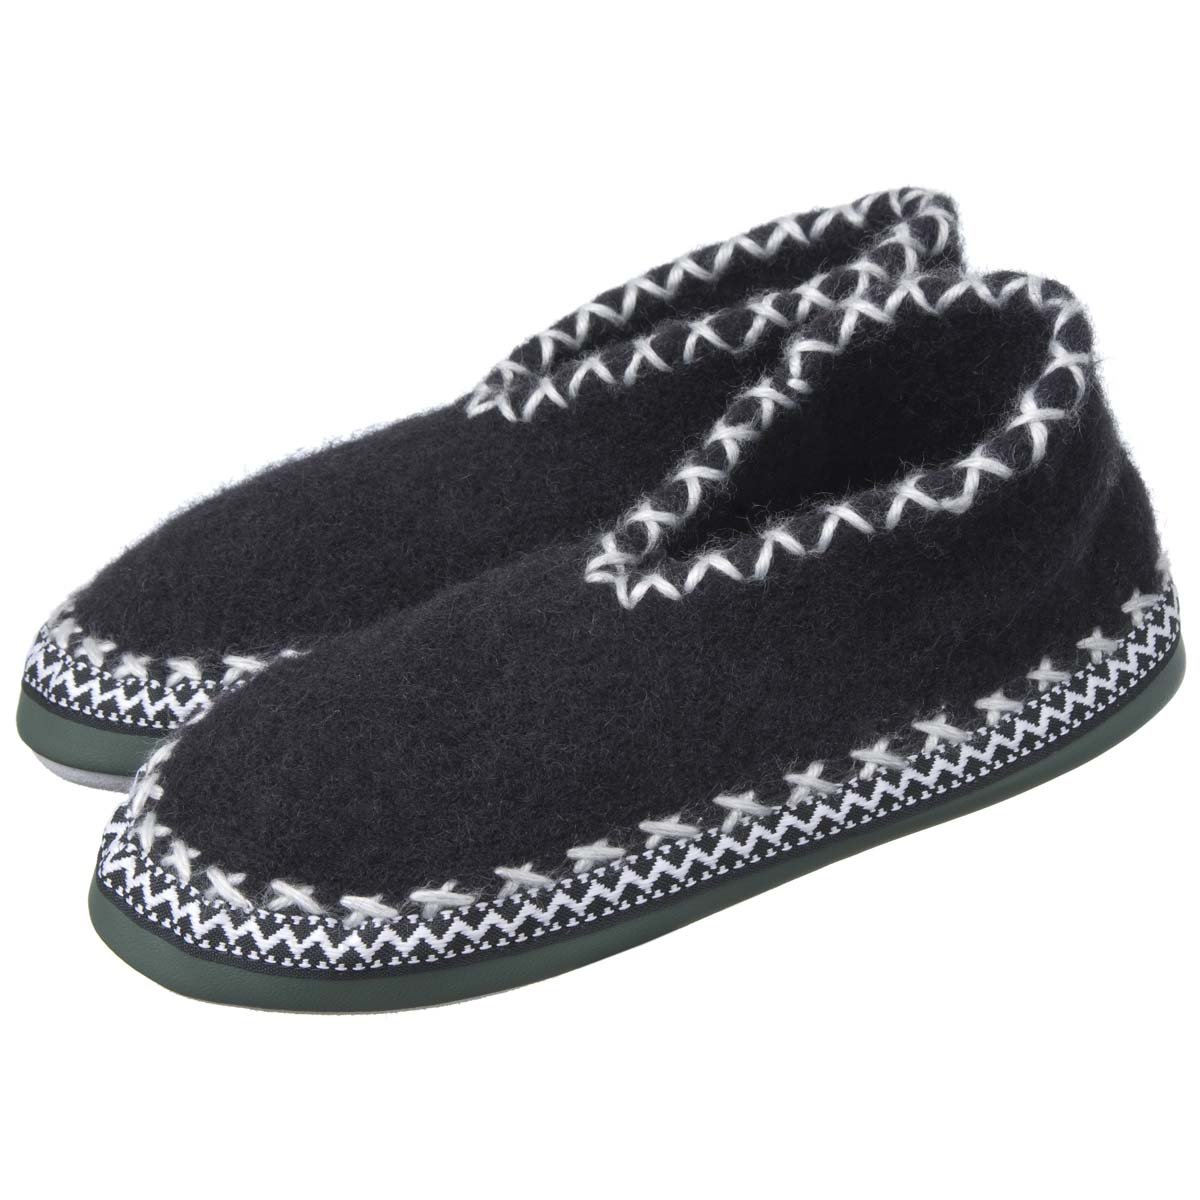 Pantofole chiuse di lana con suola in pelle ... a84d30fc3a2